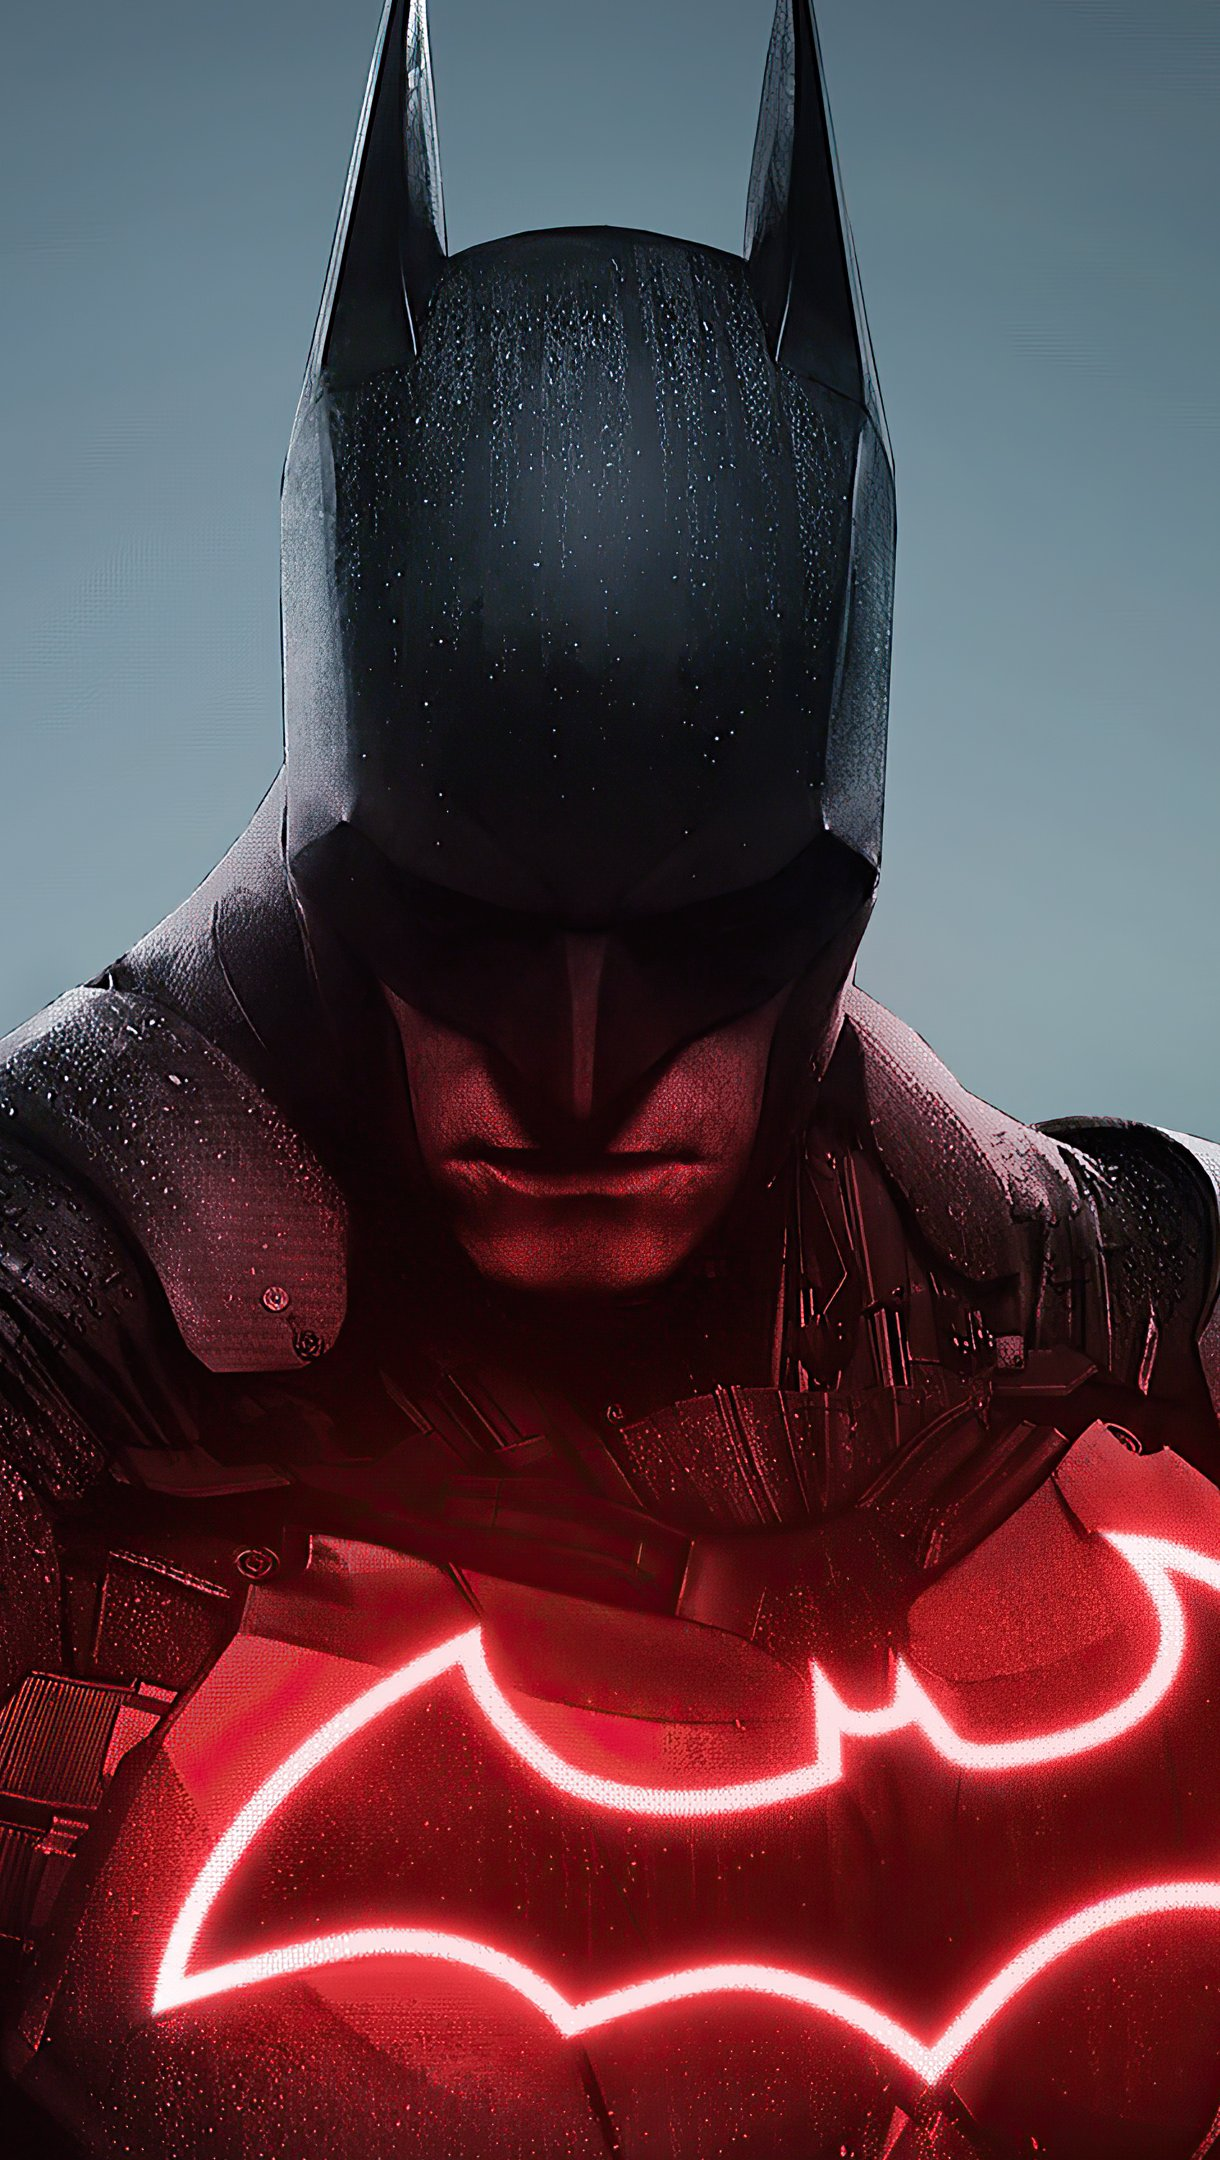 Wallpaper Batman red and black Vertical